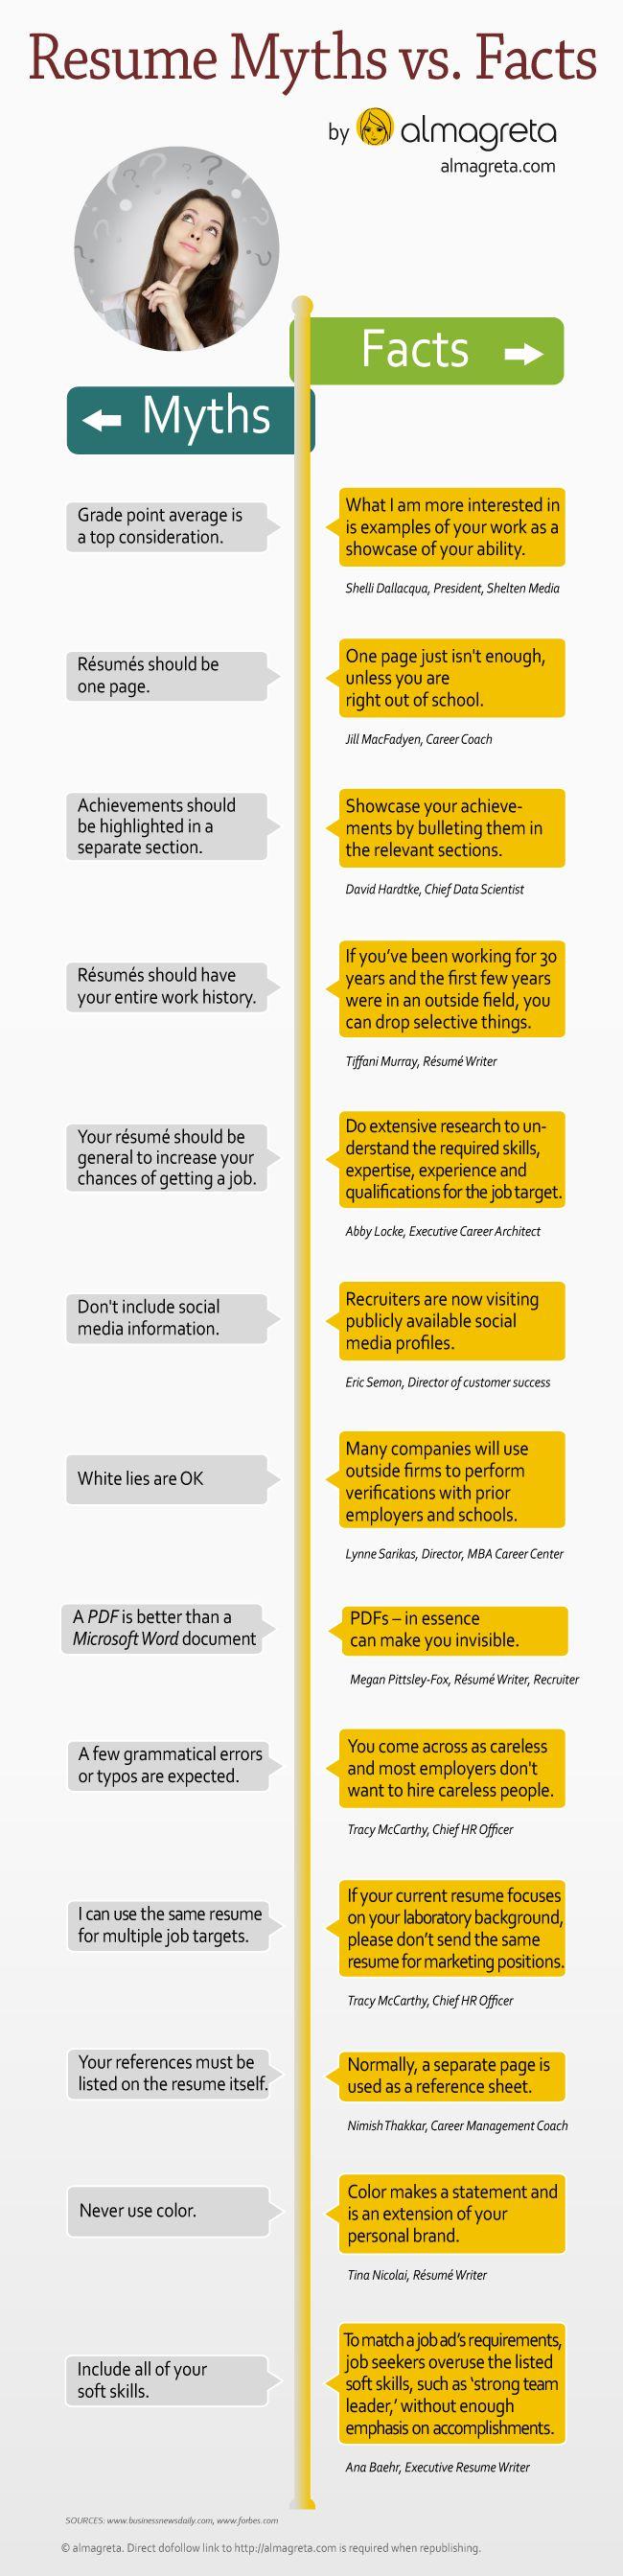 resume myths vs facts